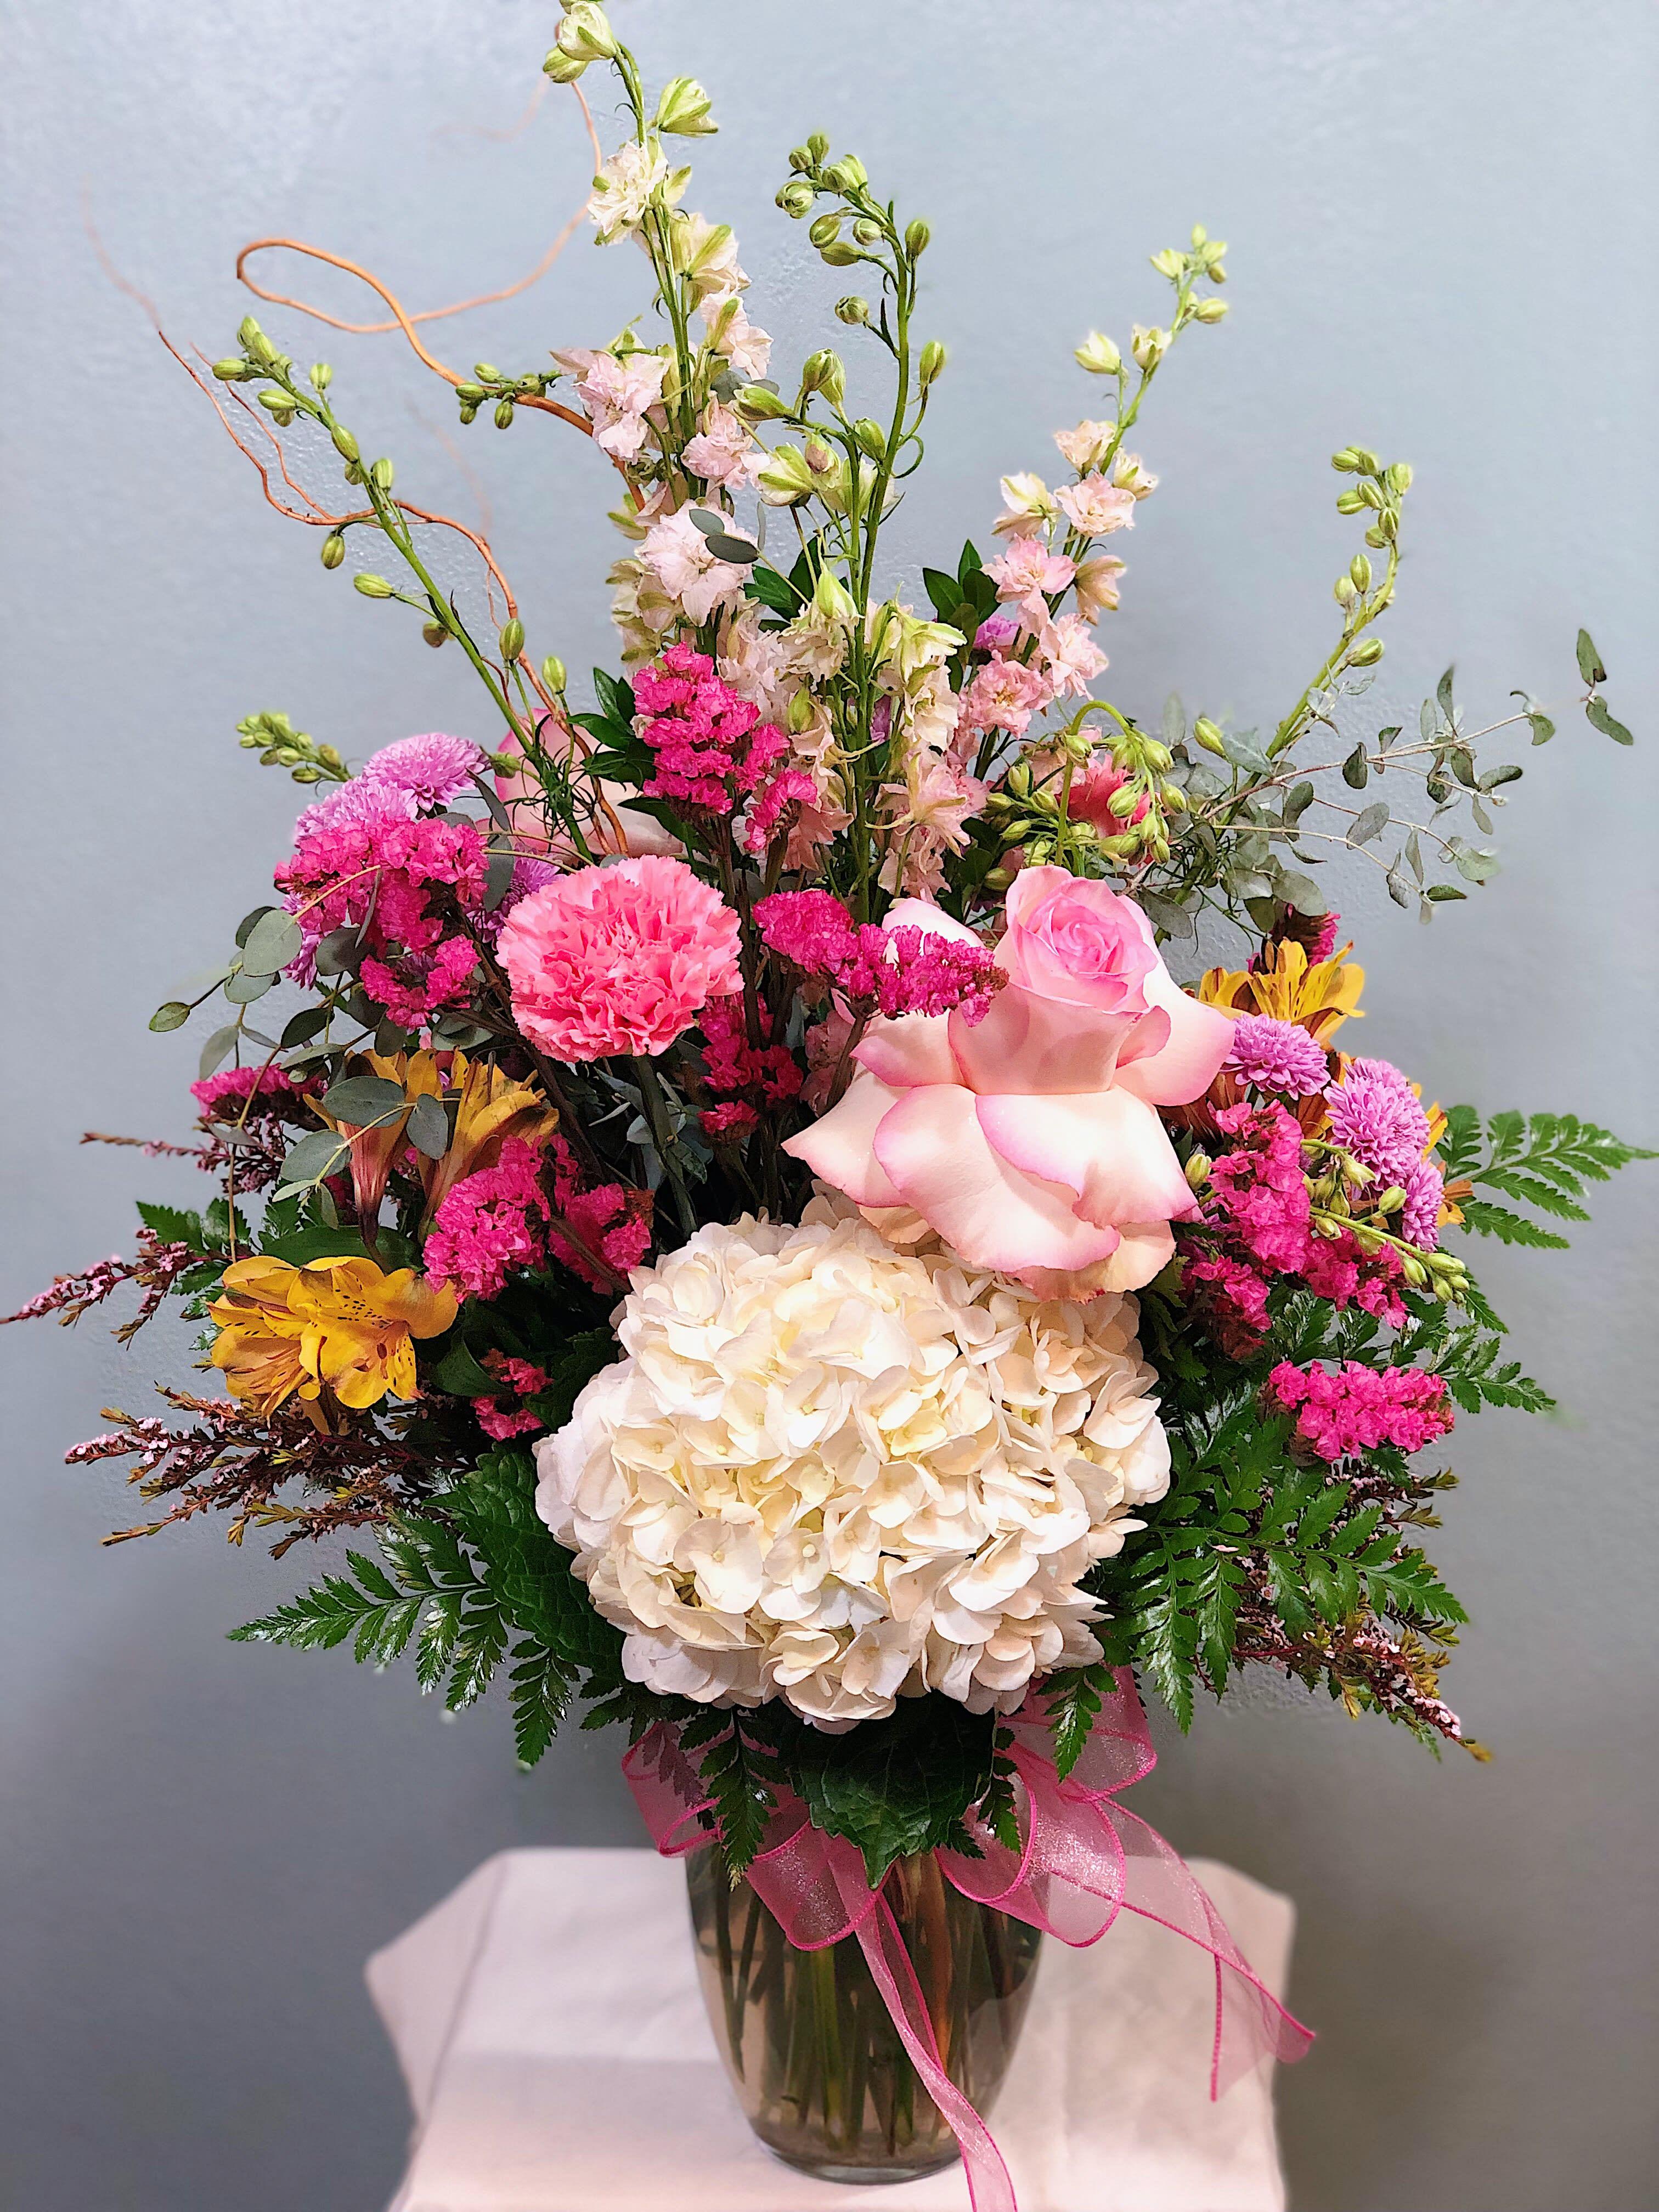 Small English Garden Pastel In Marrero La Westbank Florist Llc